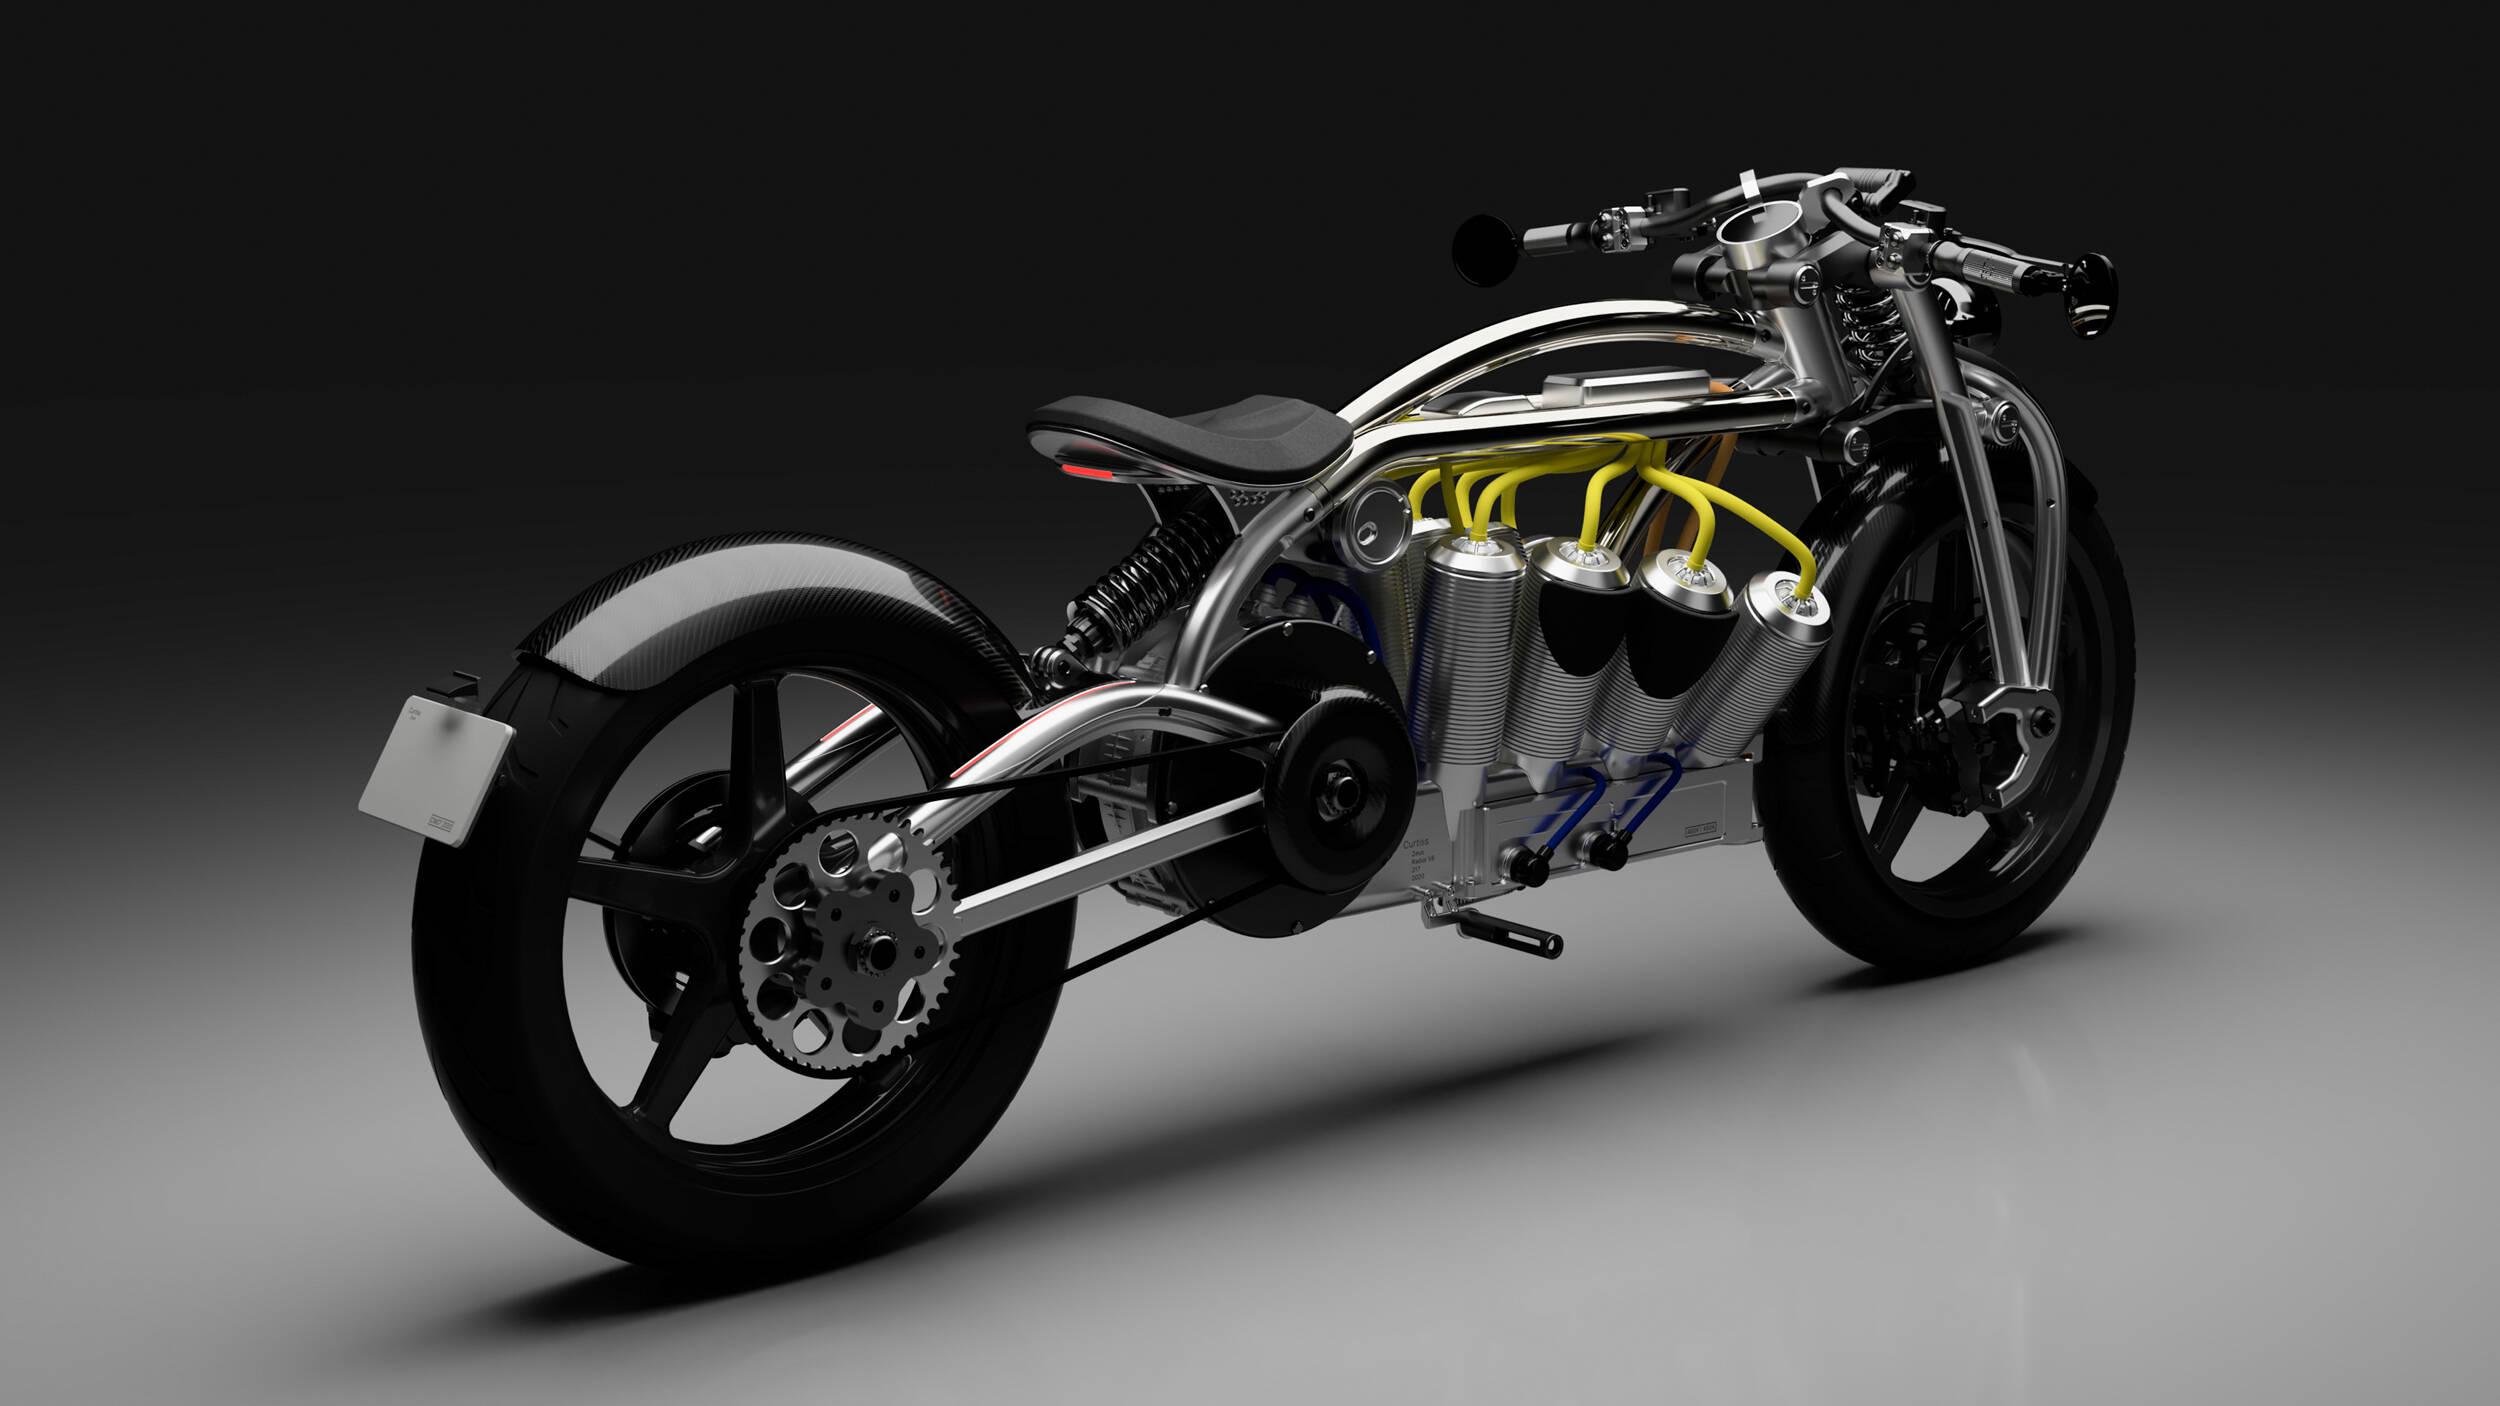 Moto elétrica Curtiss. Foto: Divulgação